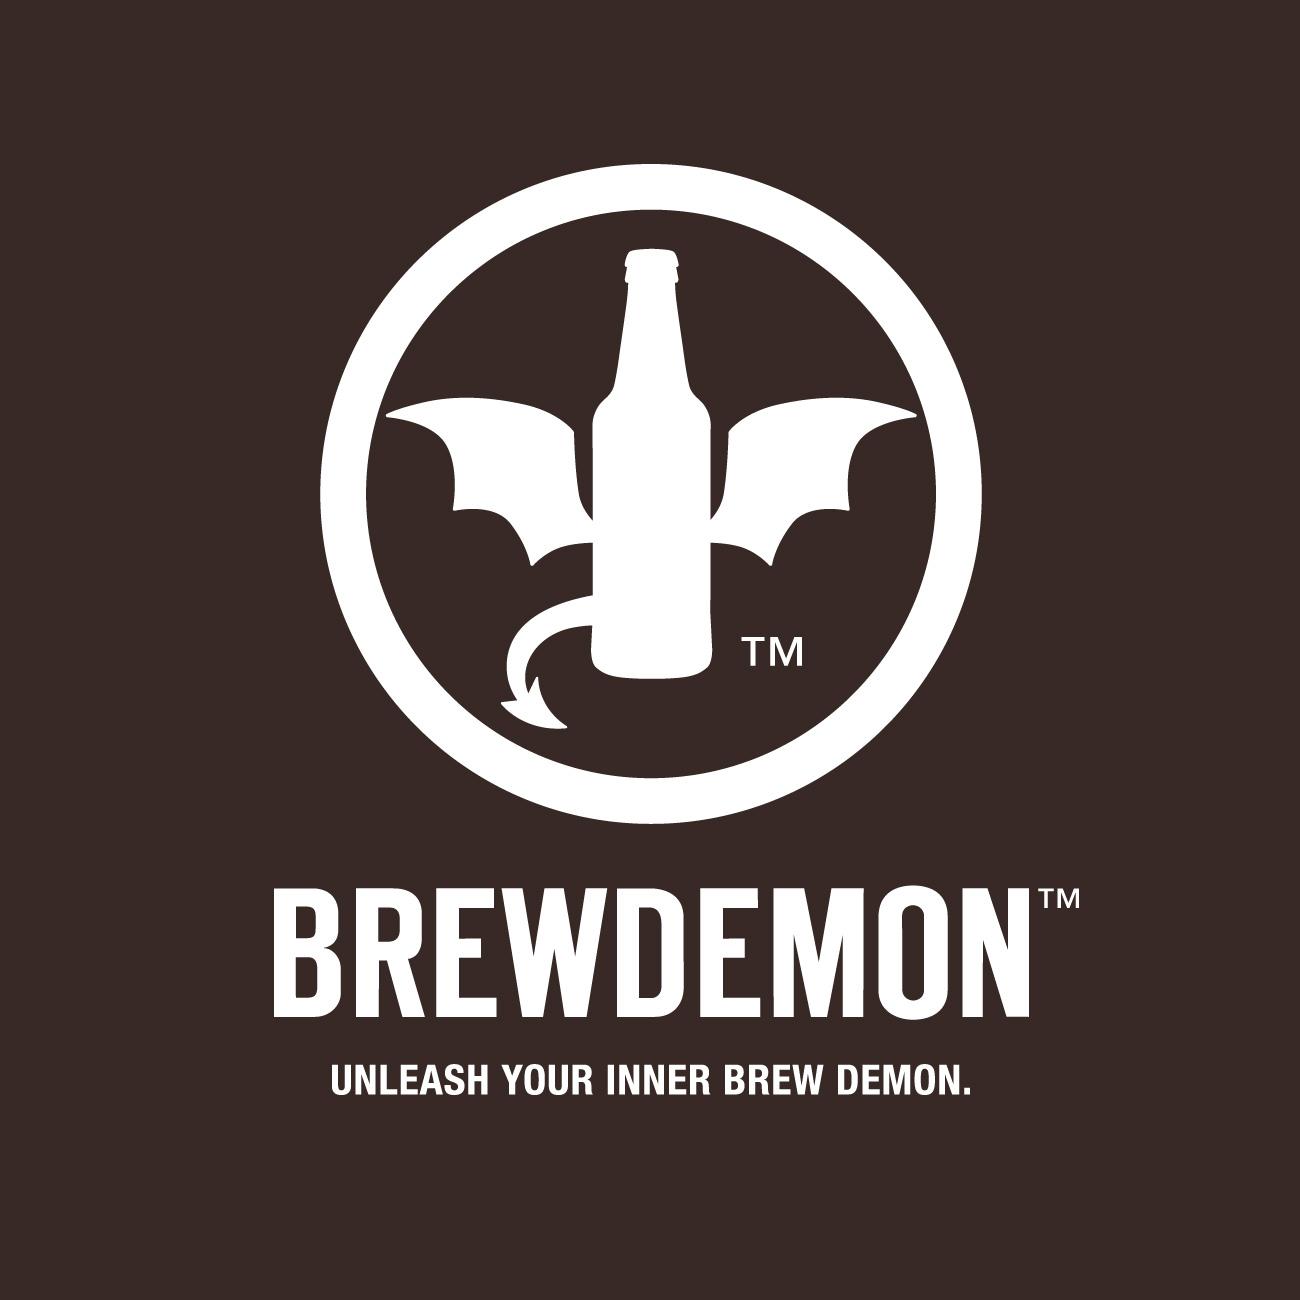 Brew Demon